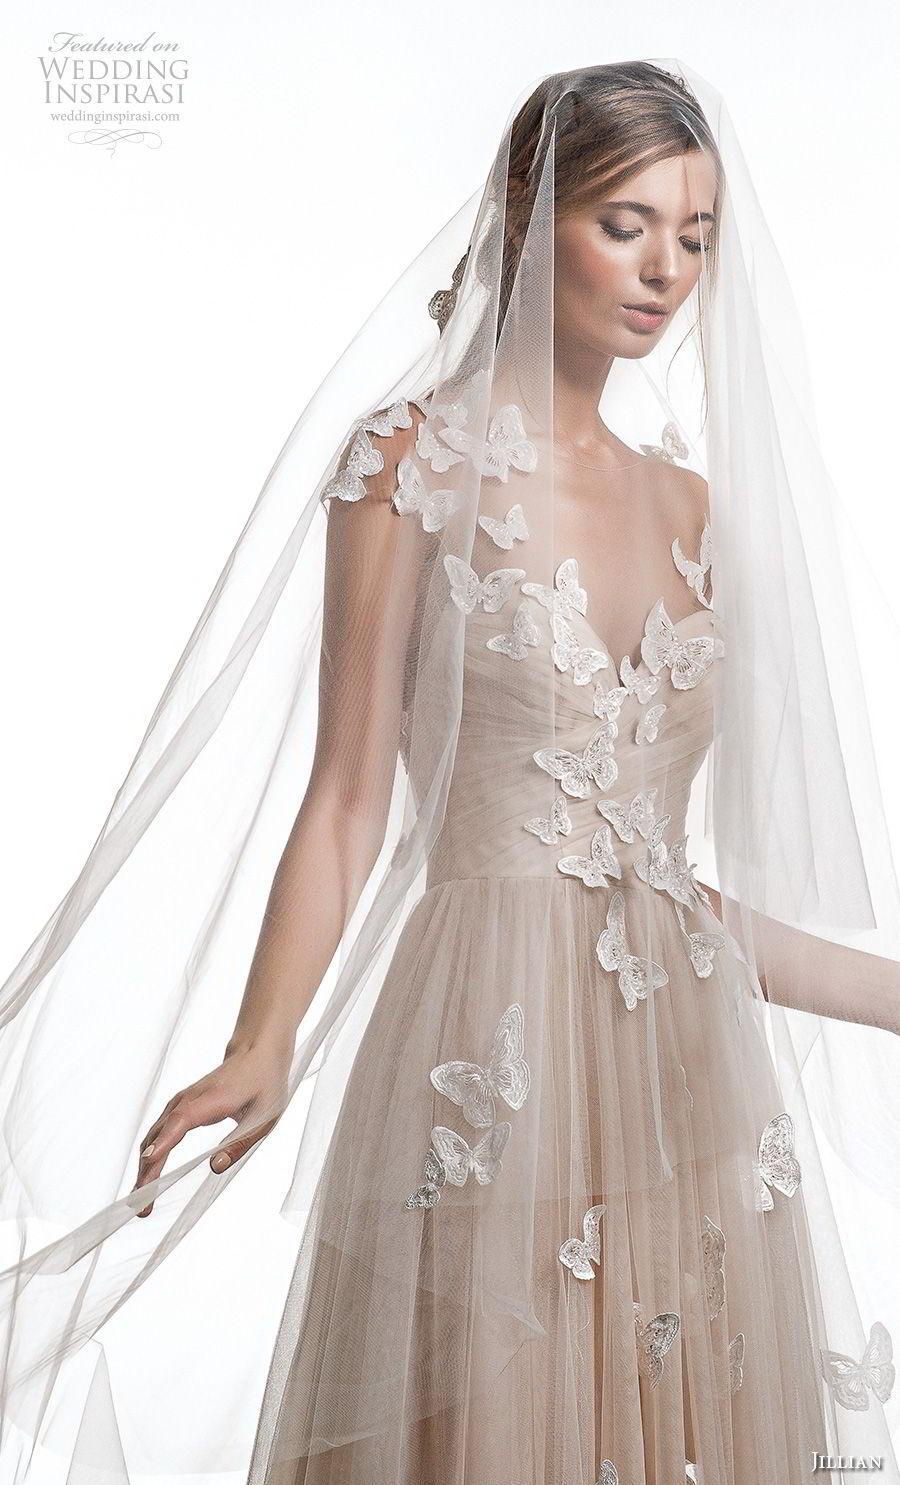 jillian 2019 bridal cap sleeves illusion bateau sweetheart neckline heavily embellished bodice romantic champagne modified a  line wedding dress open back medium train (5) zv